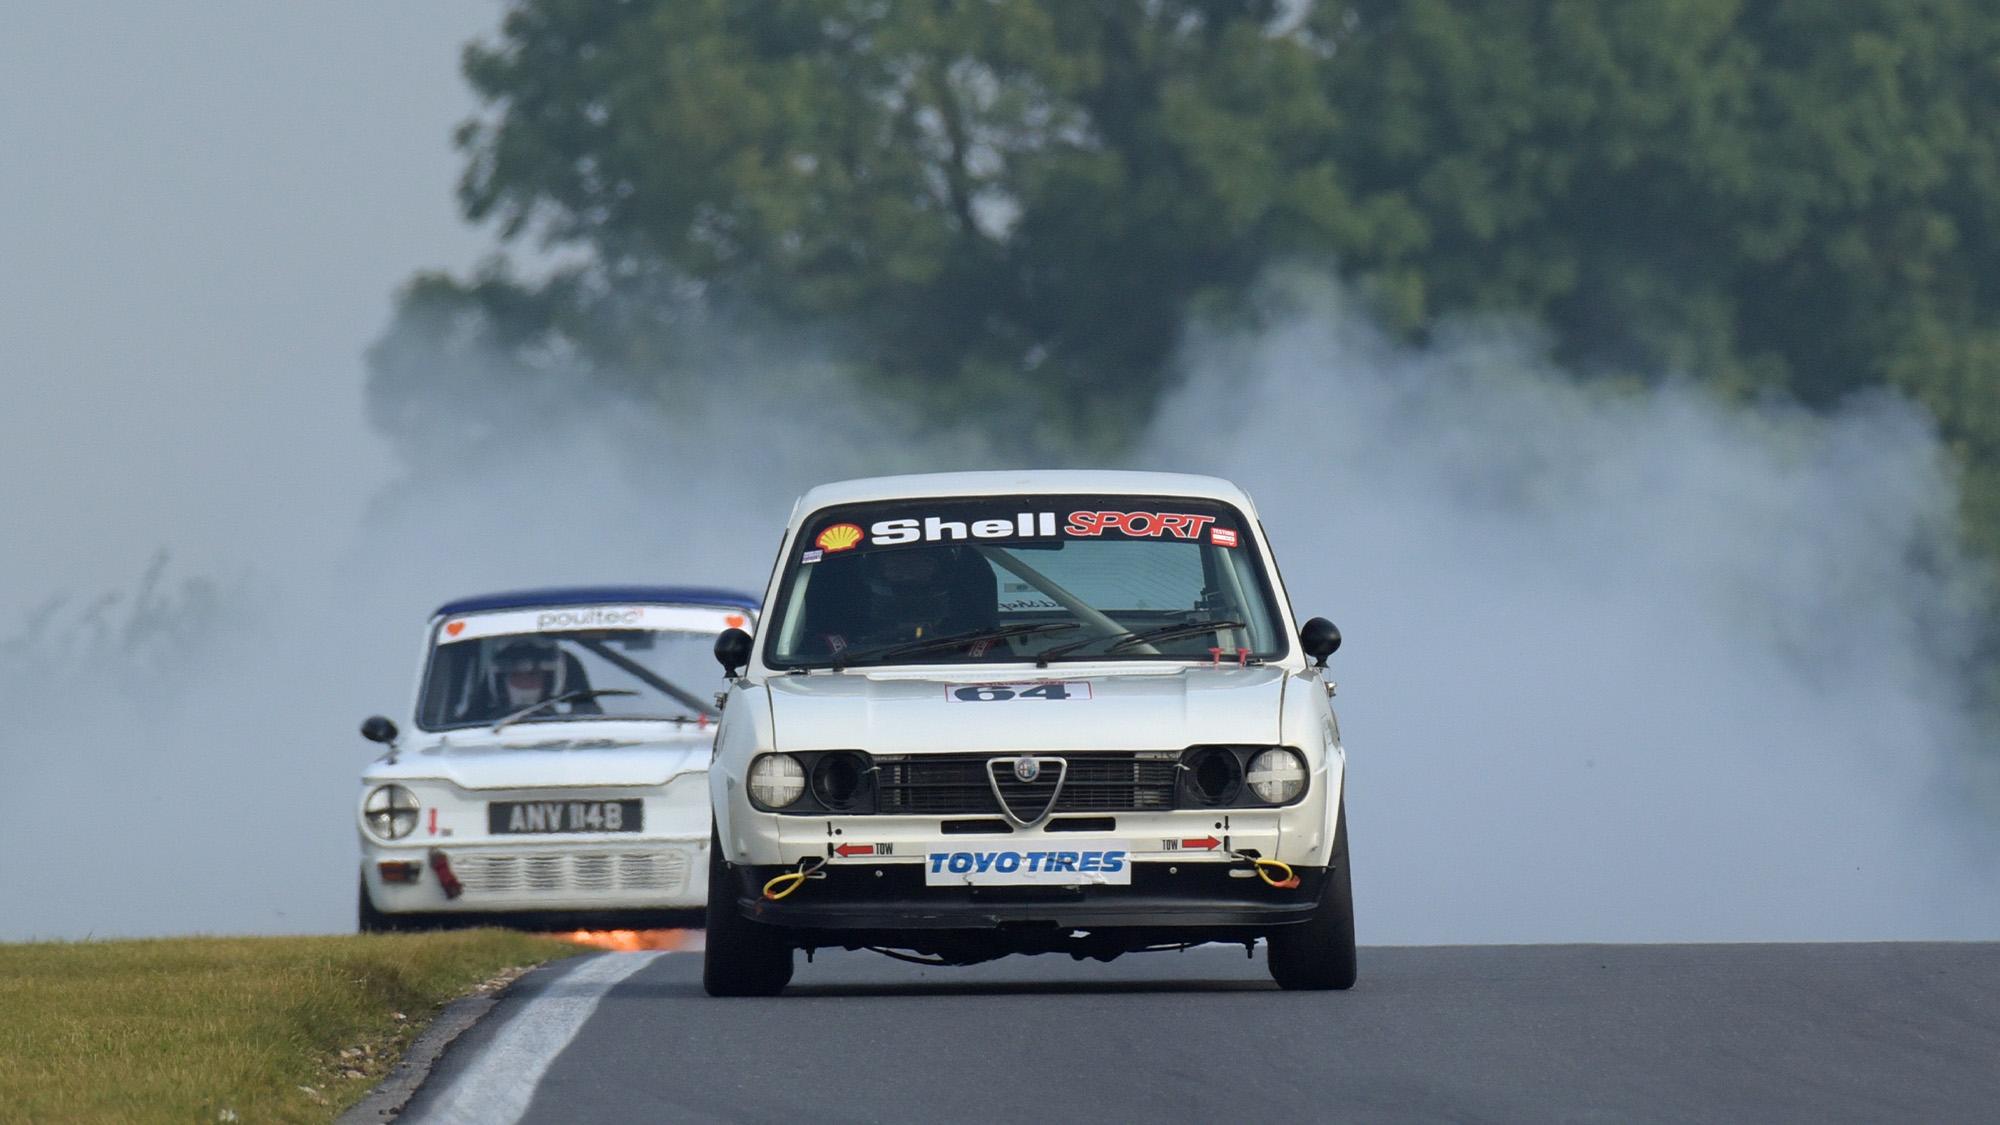 Alfasud of Keith Evans ahead of Hillman Imp on fire